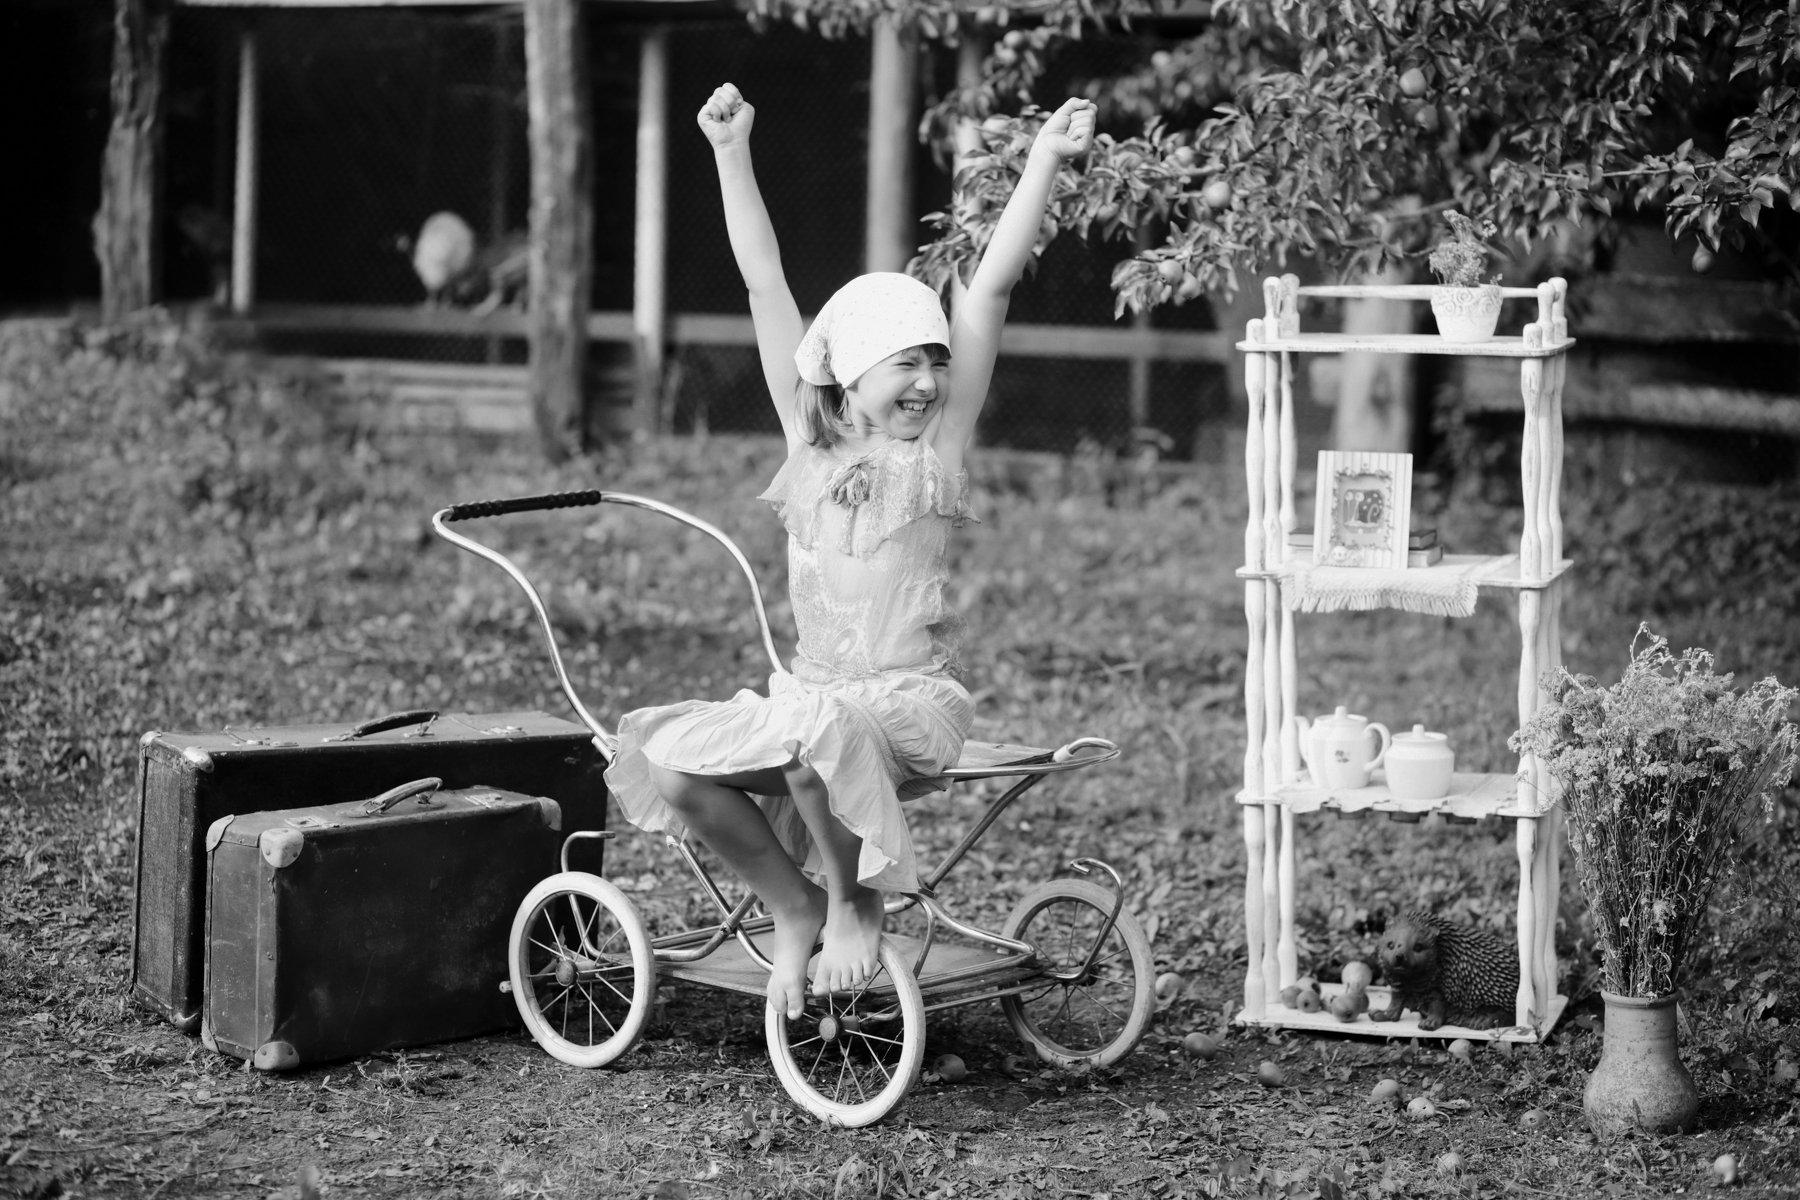 черно-белое фото , лето, деревенская тема, Вера Шамраева